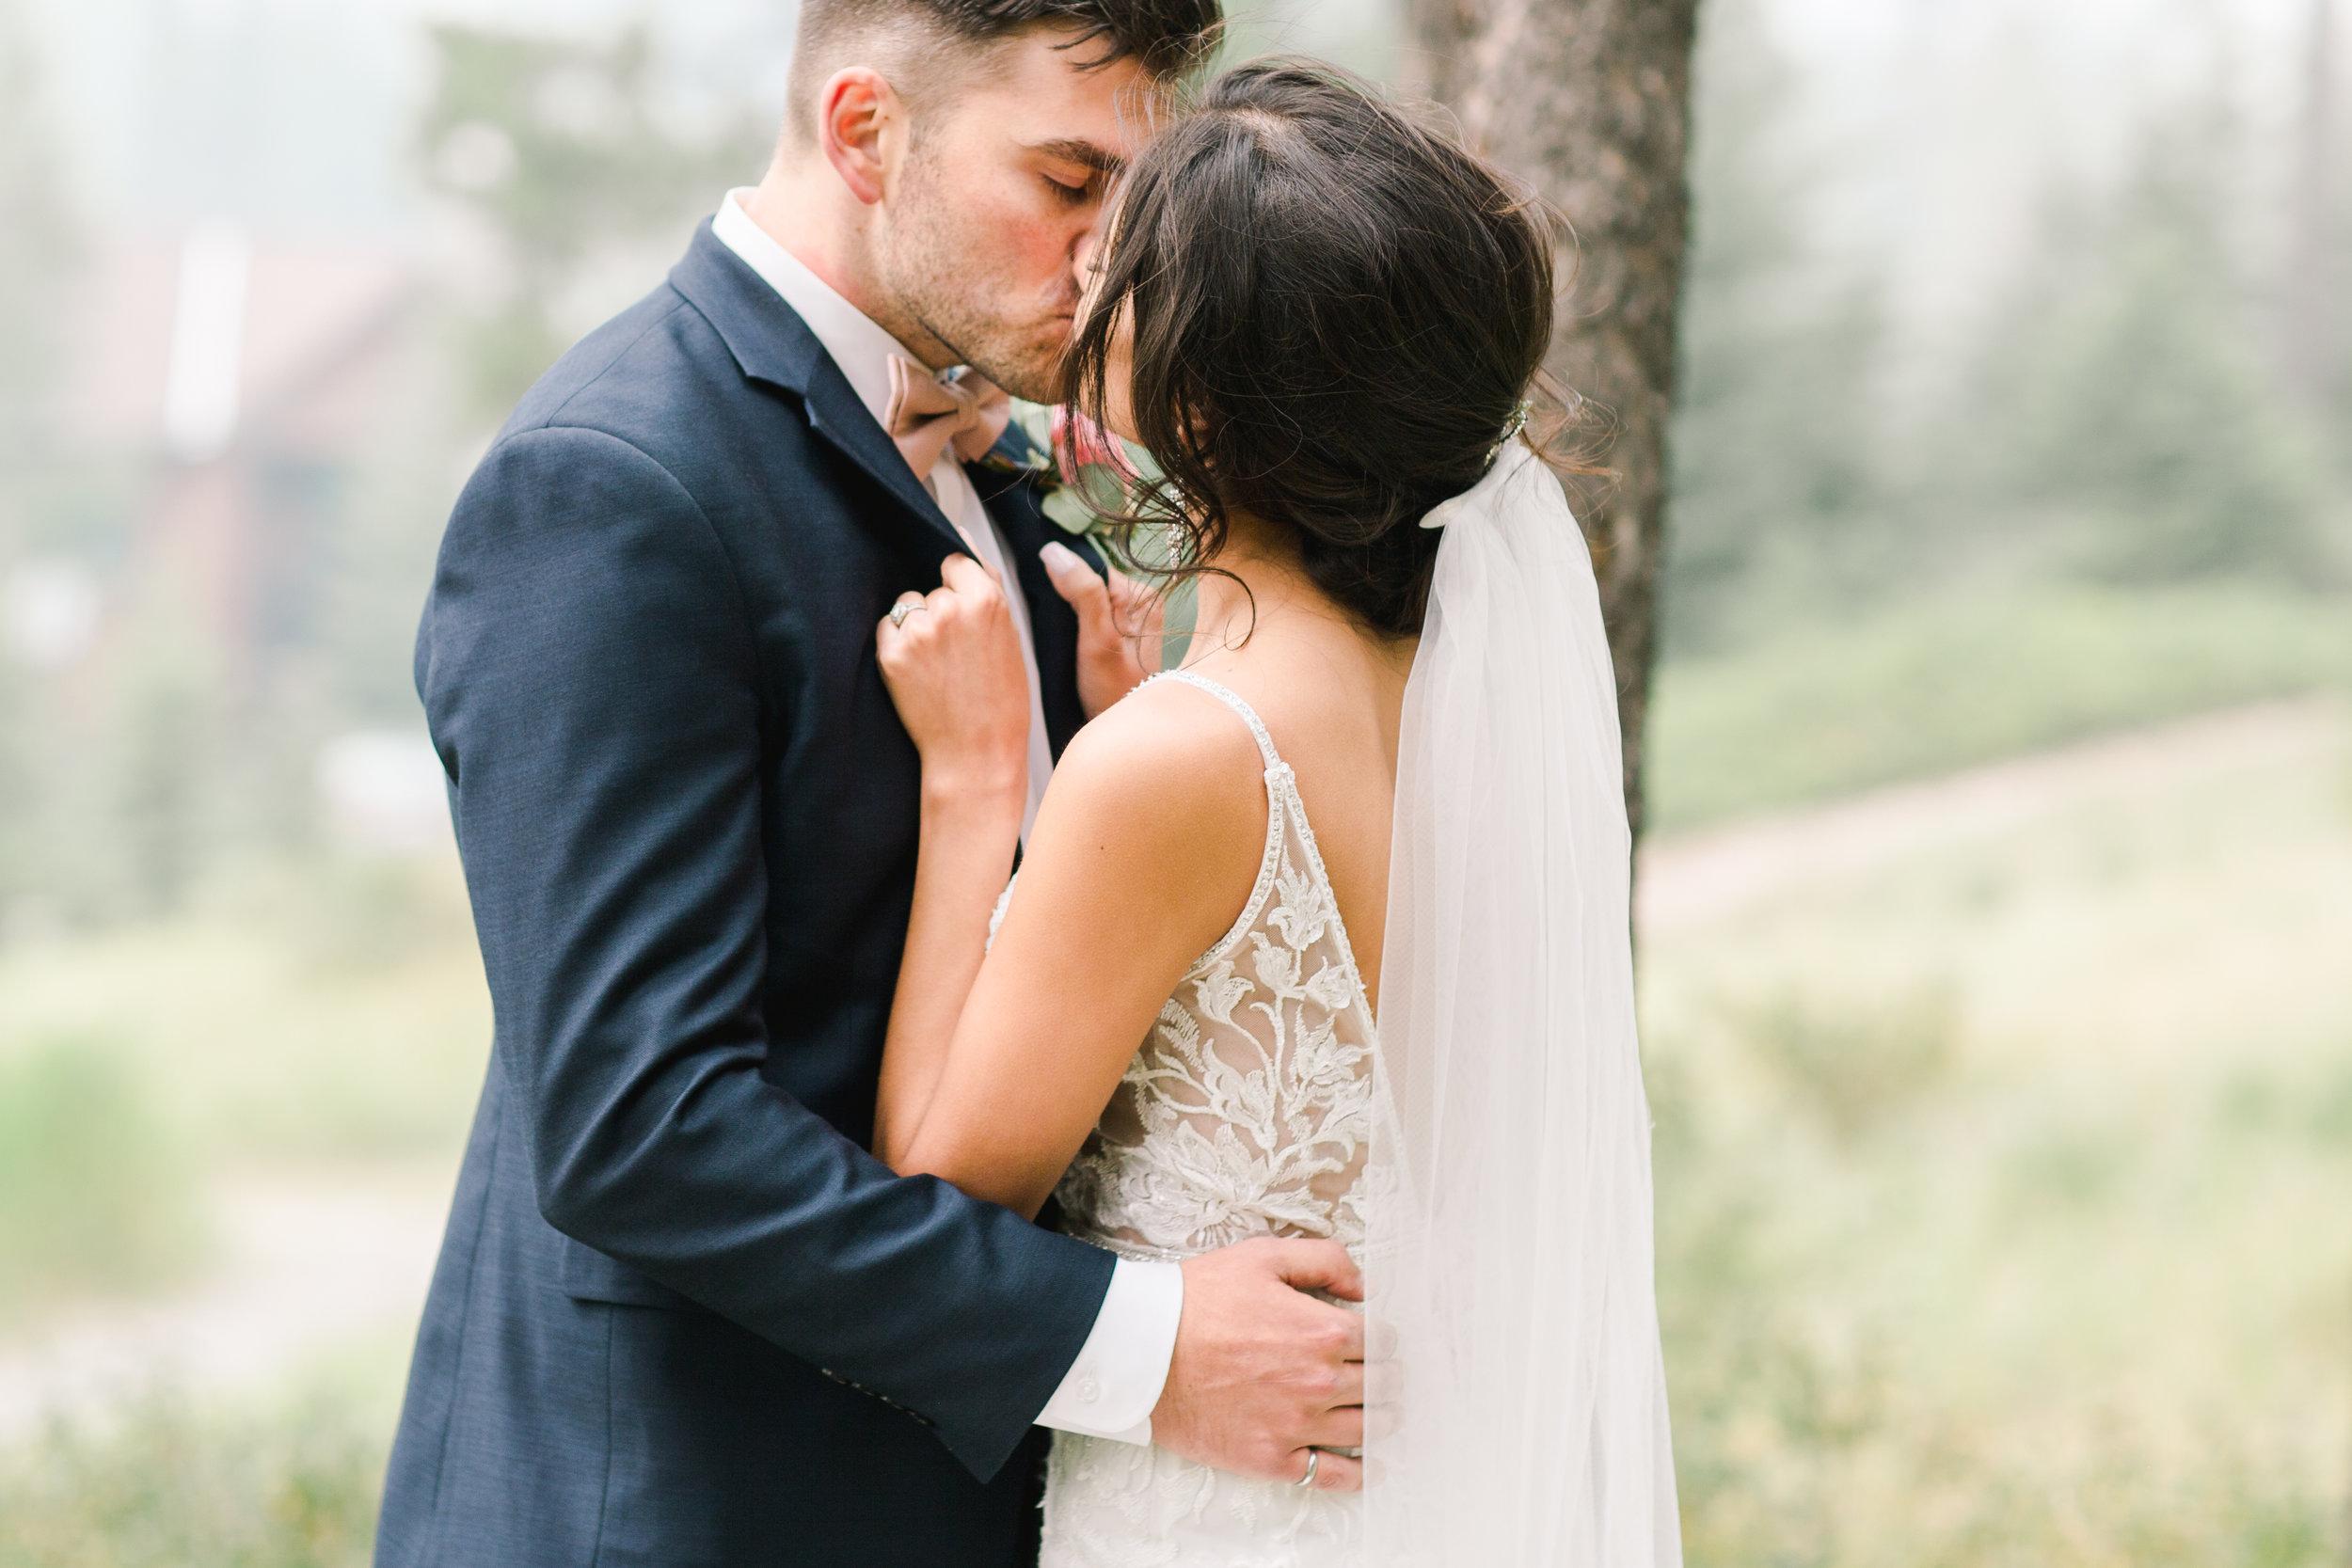 Banff Wedding Brett Suheily (572 of 628)-2.jpg